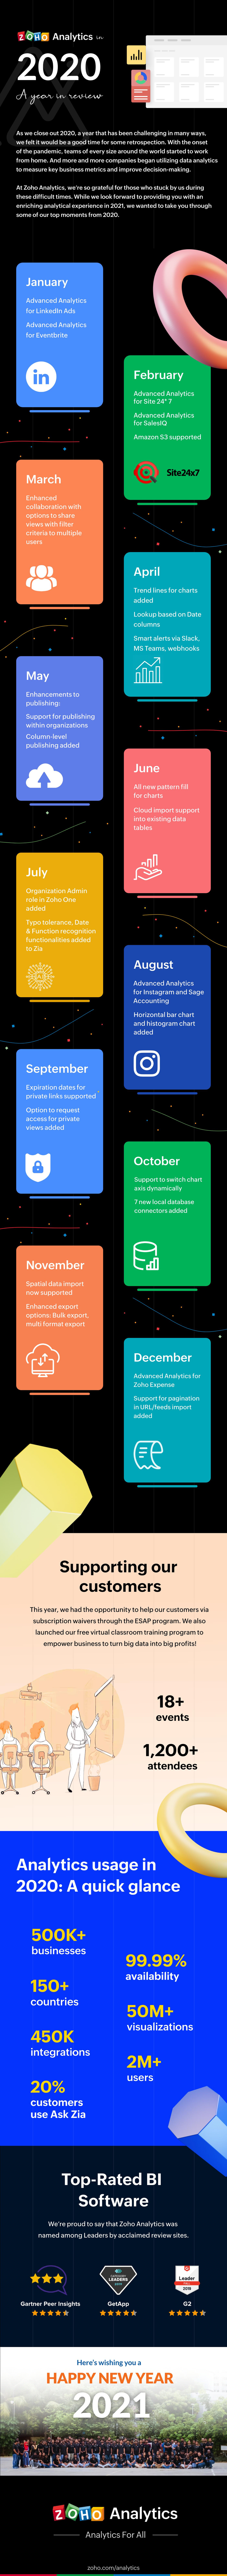 Zoho Analytics in 2020